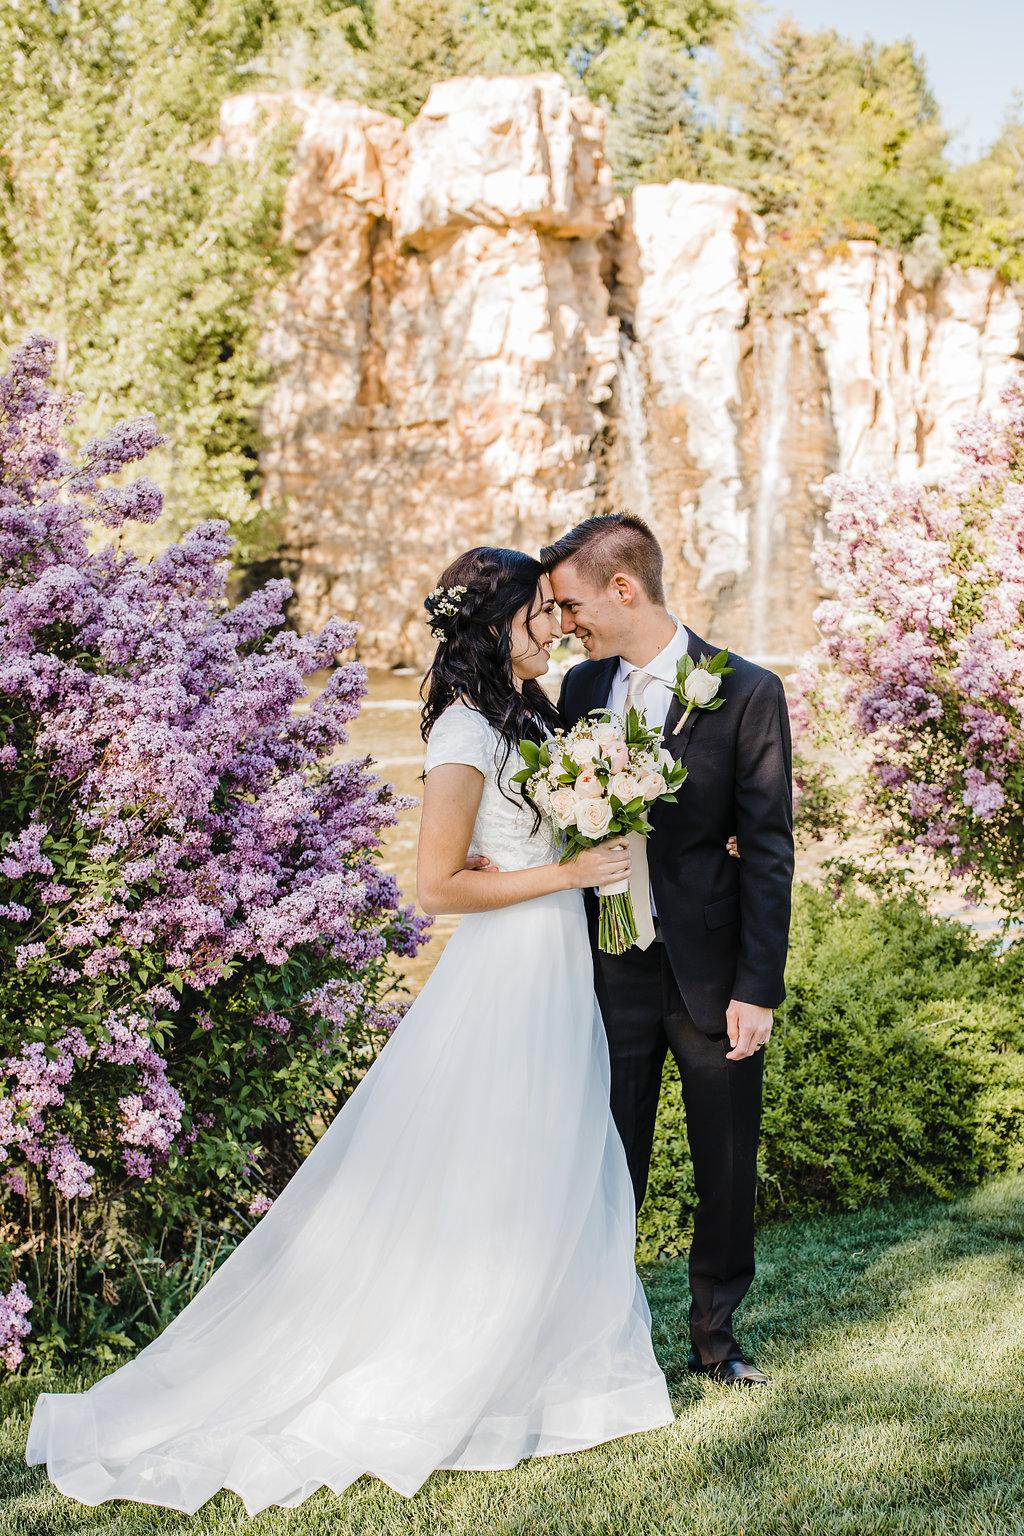 floral romantic professional wedding day photos best wedding photographer in salt lake city utah